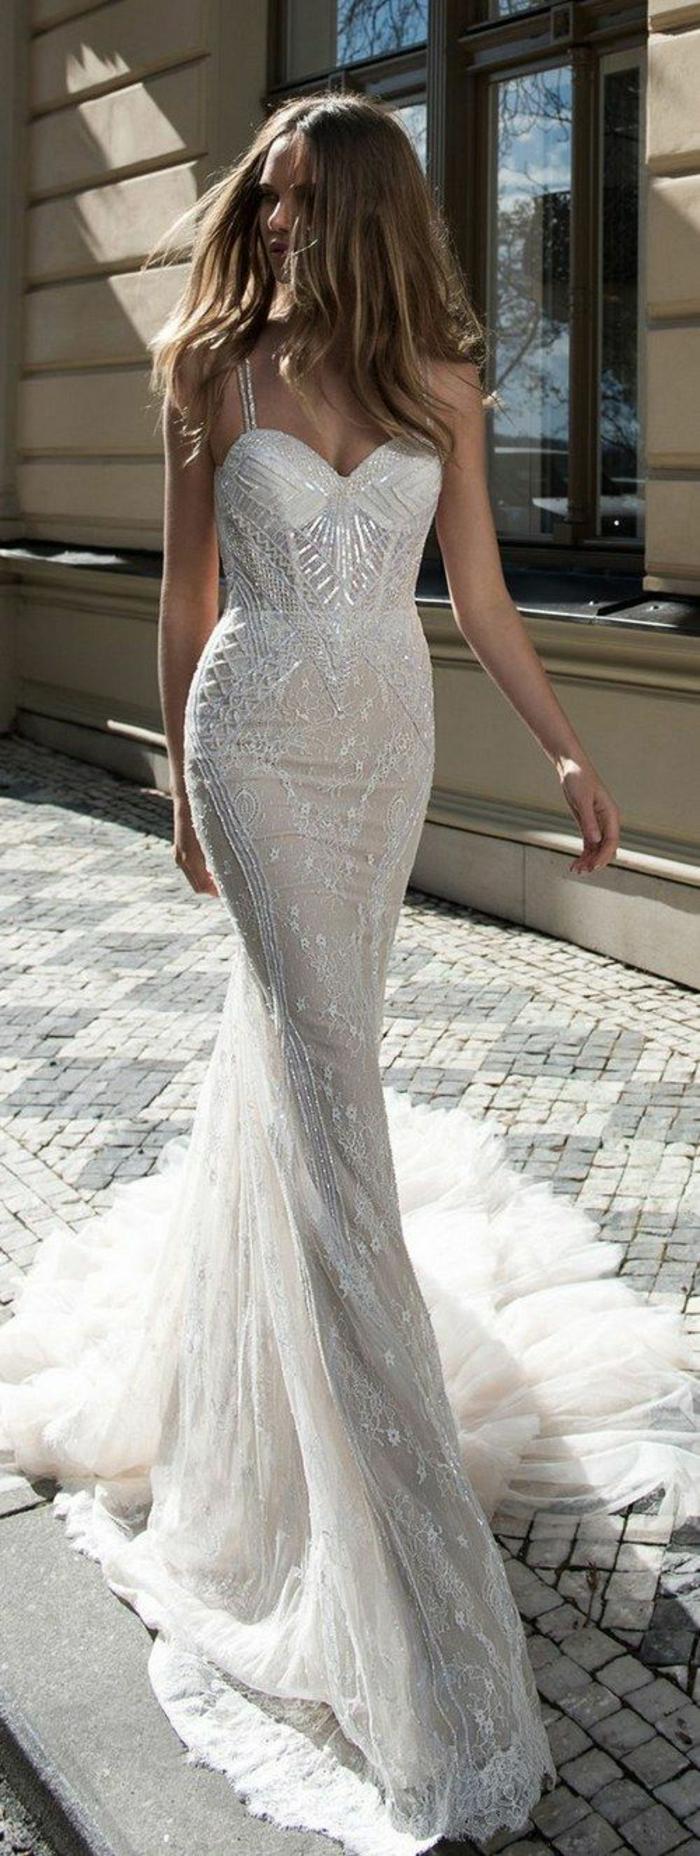 chouette-idee-robe-de-mariee-sirene-beauté-moderne-robe-contemporaine-mariage